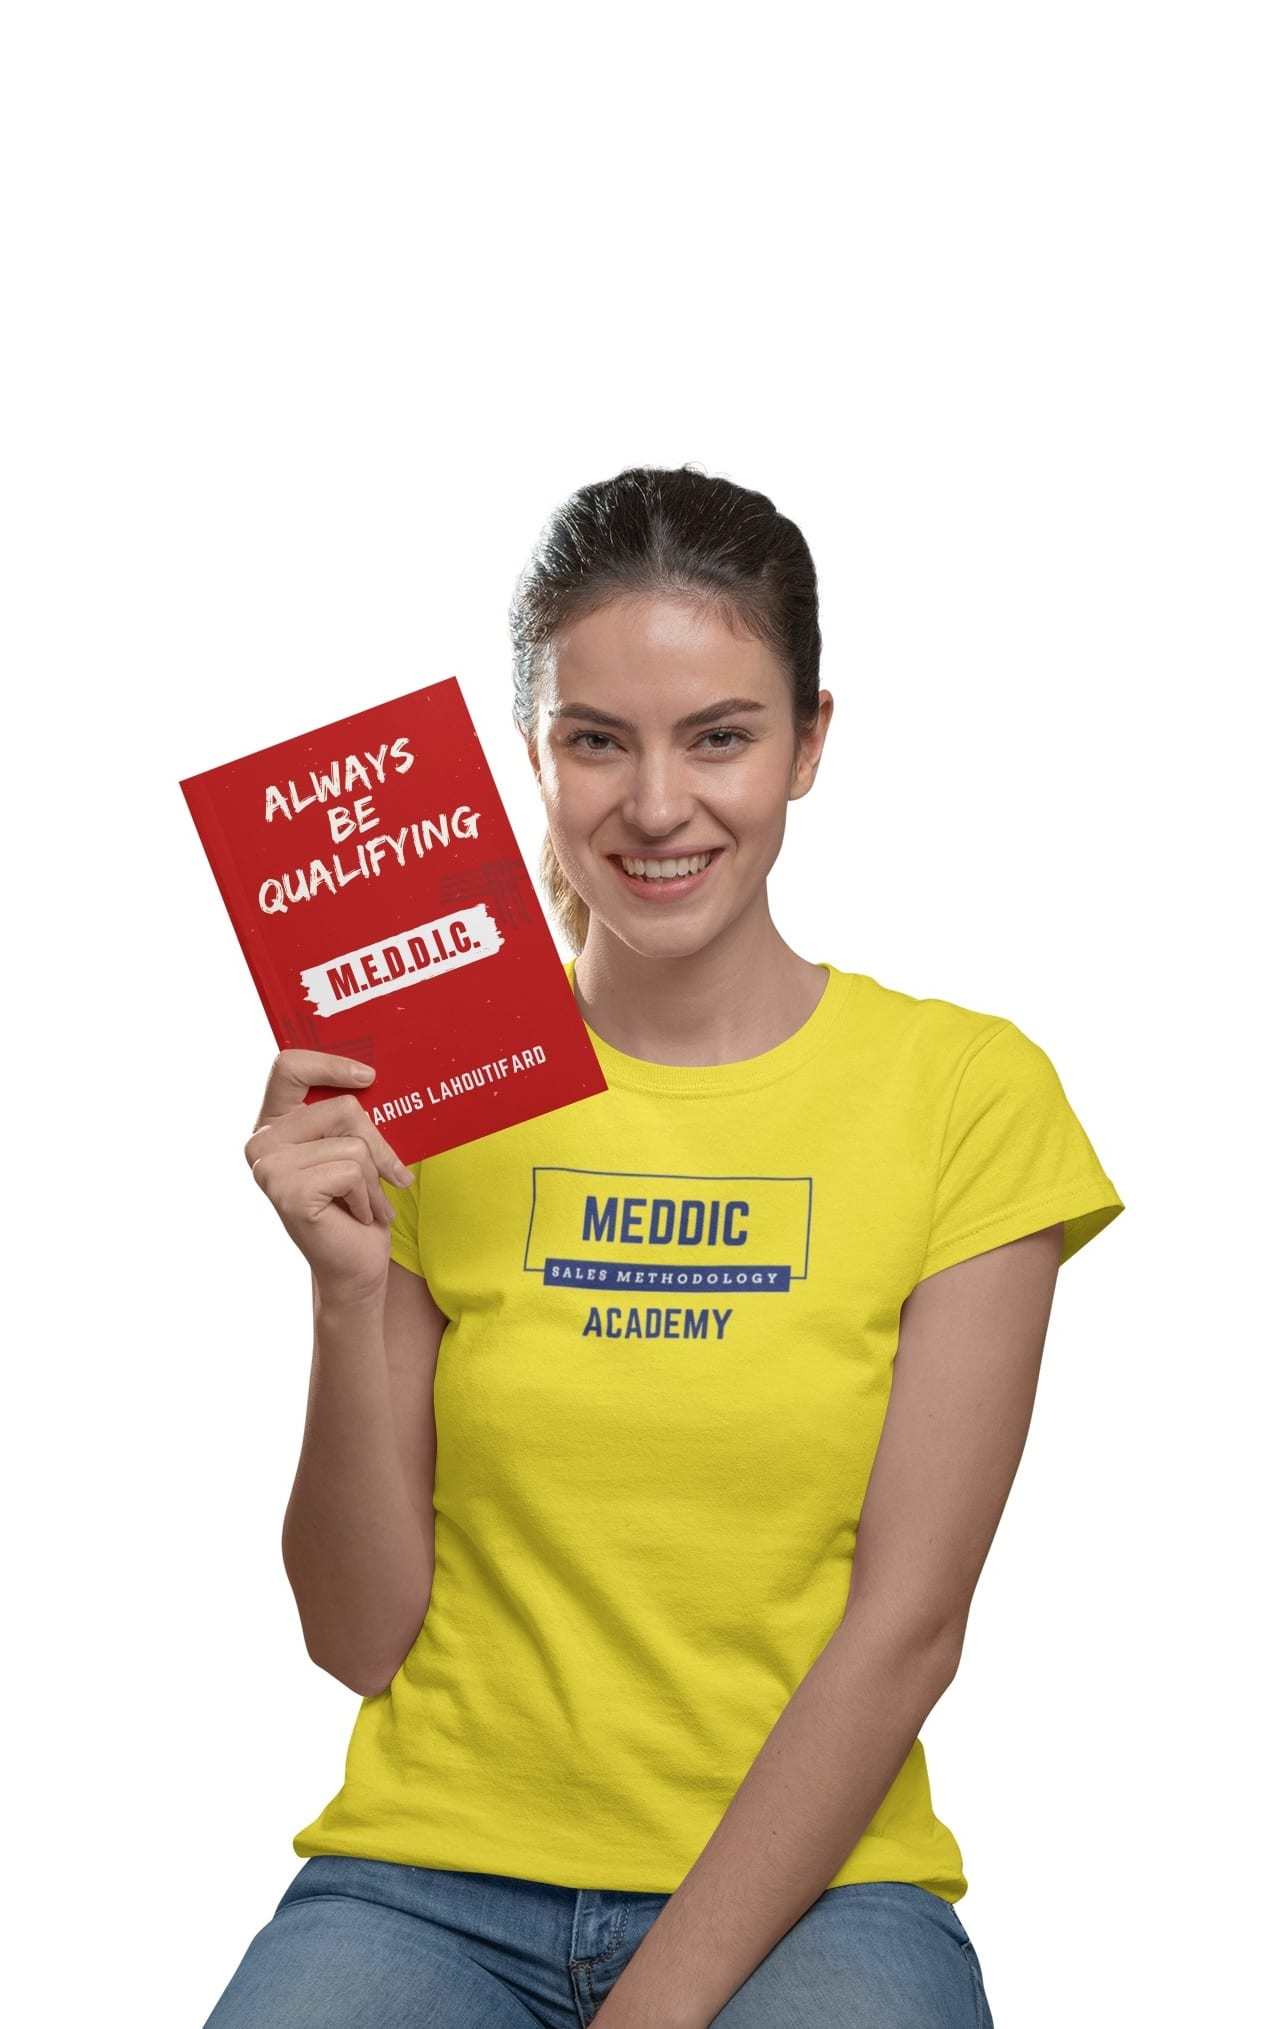 Meddic the book